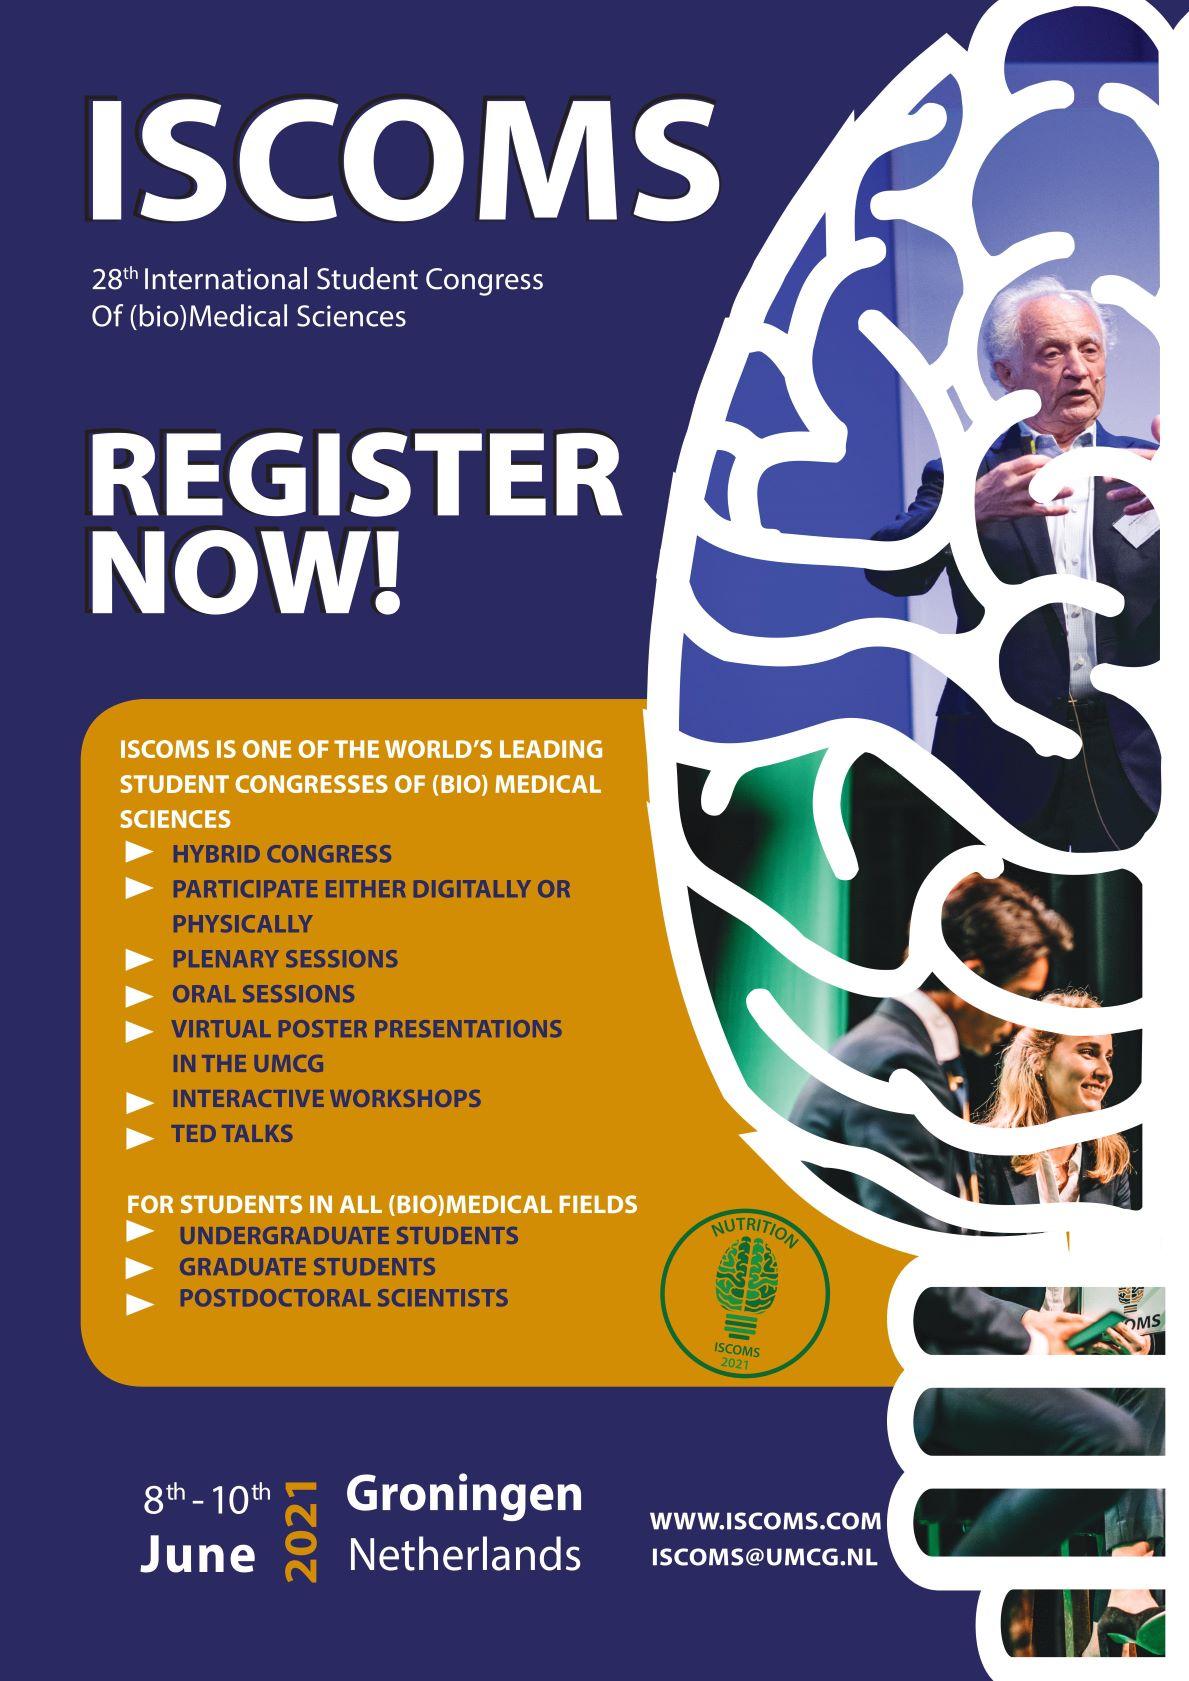 International Student Congress Of (bio)Medical Sciences (ISCOMS)